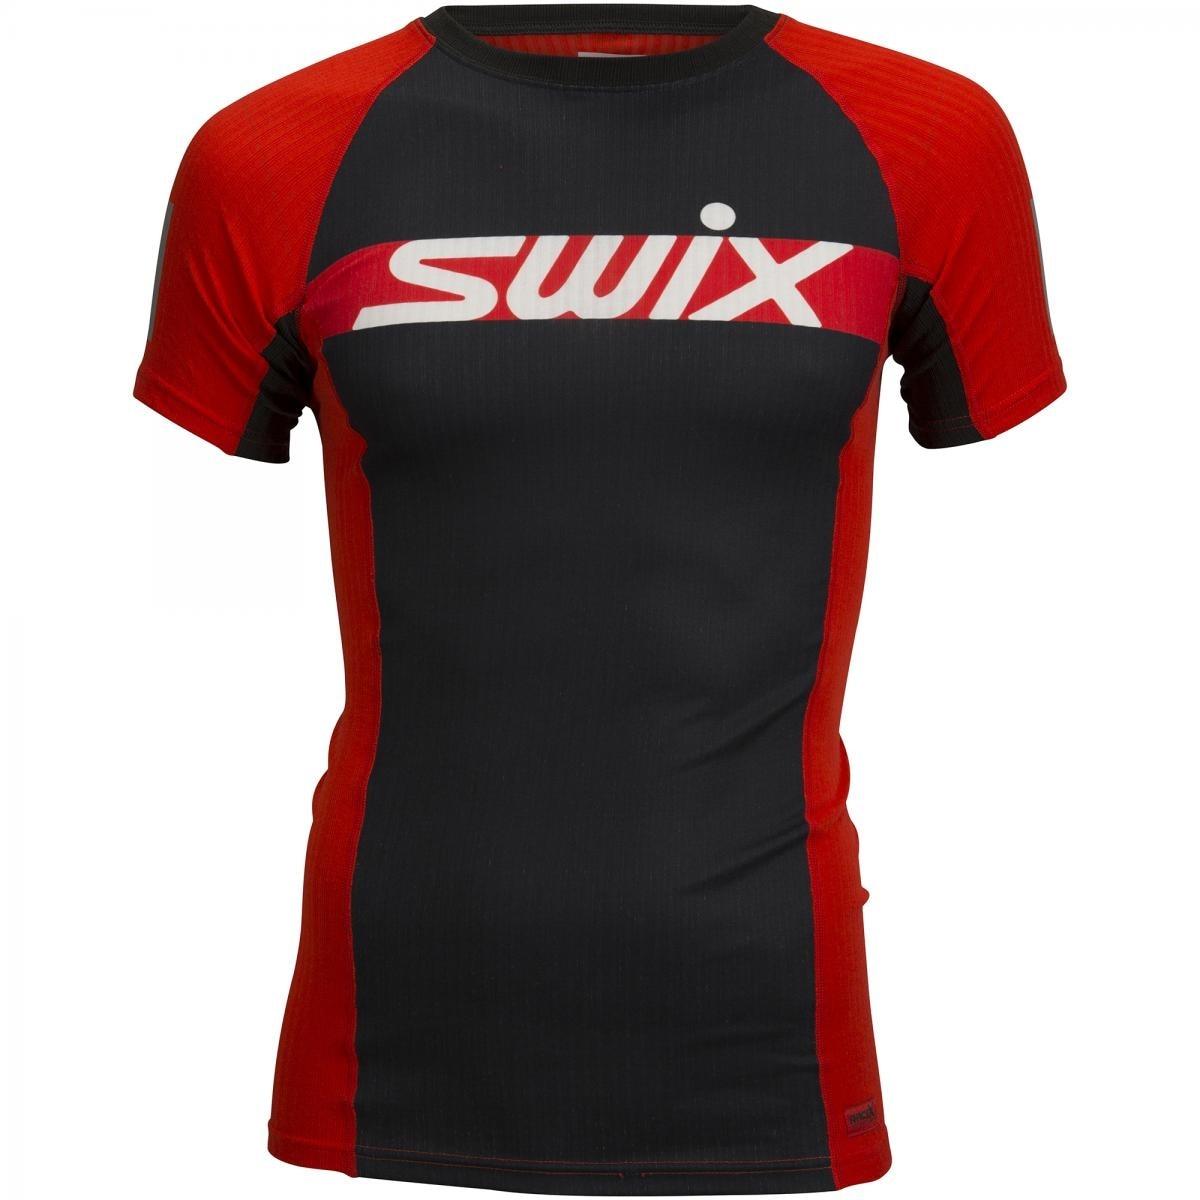 Swix RaceX Carbon Treningstrøye Herre Sort/Rød